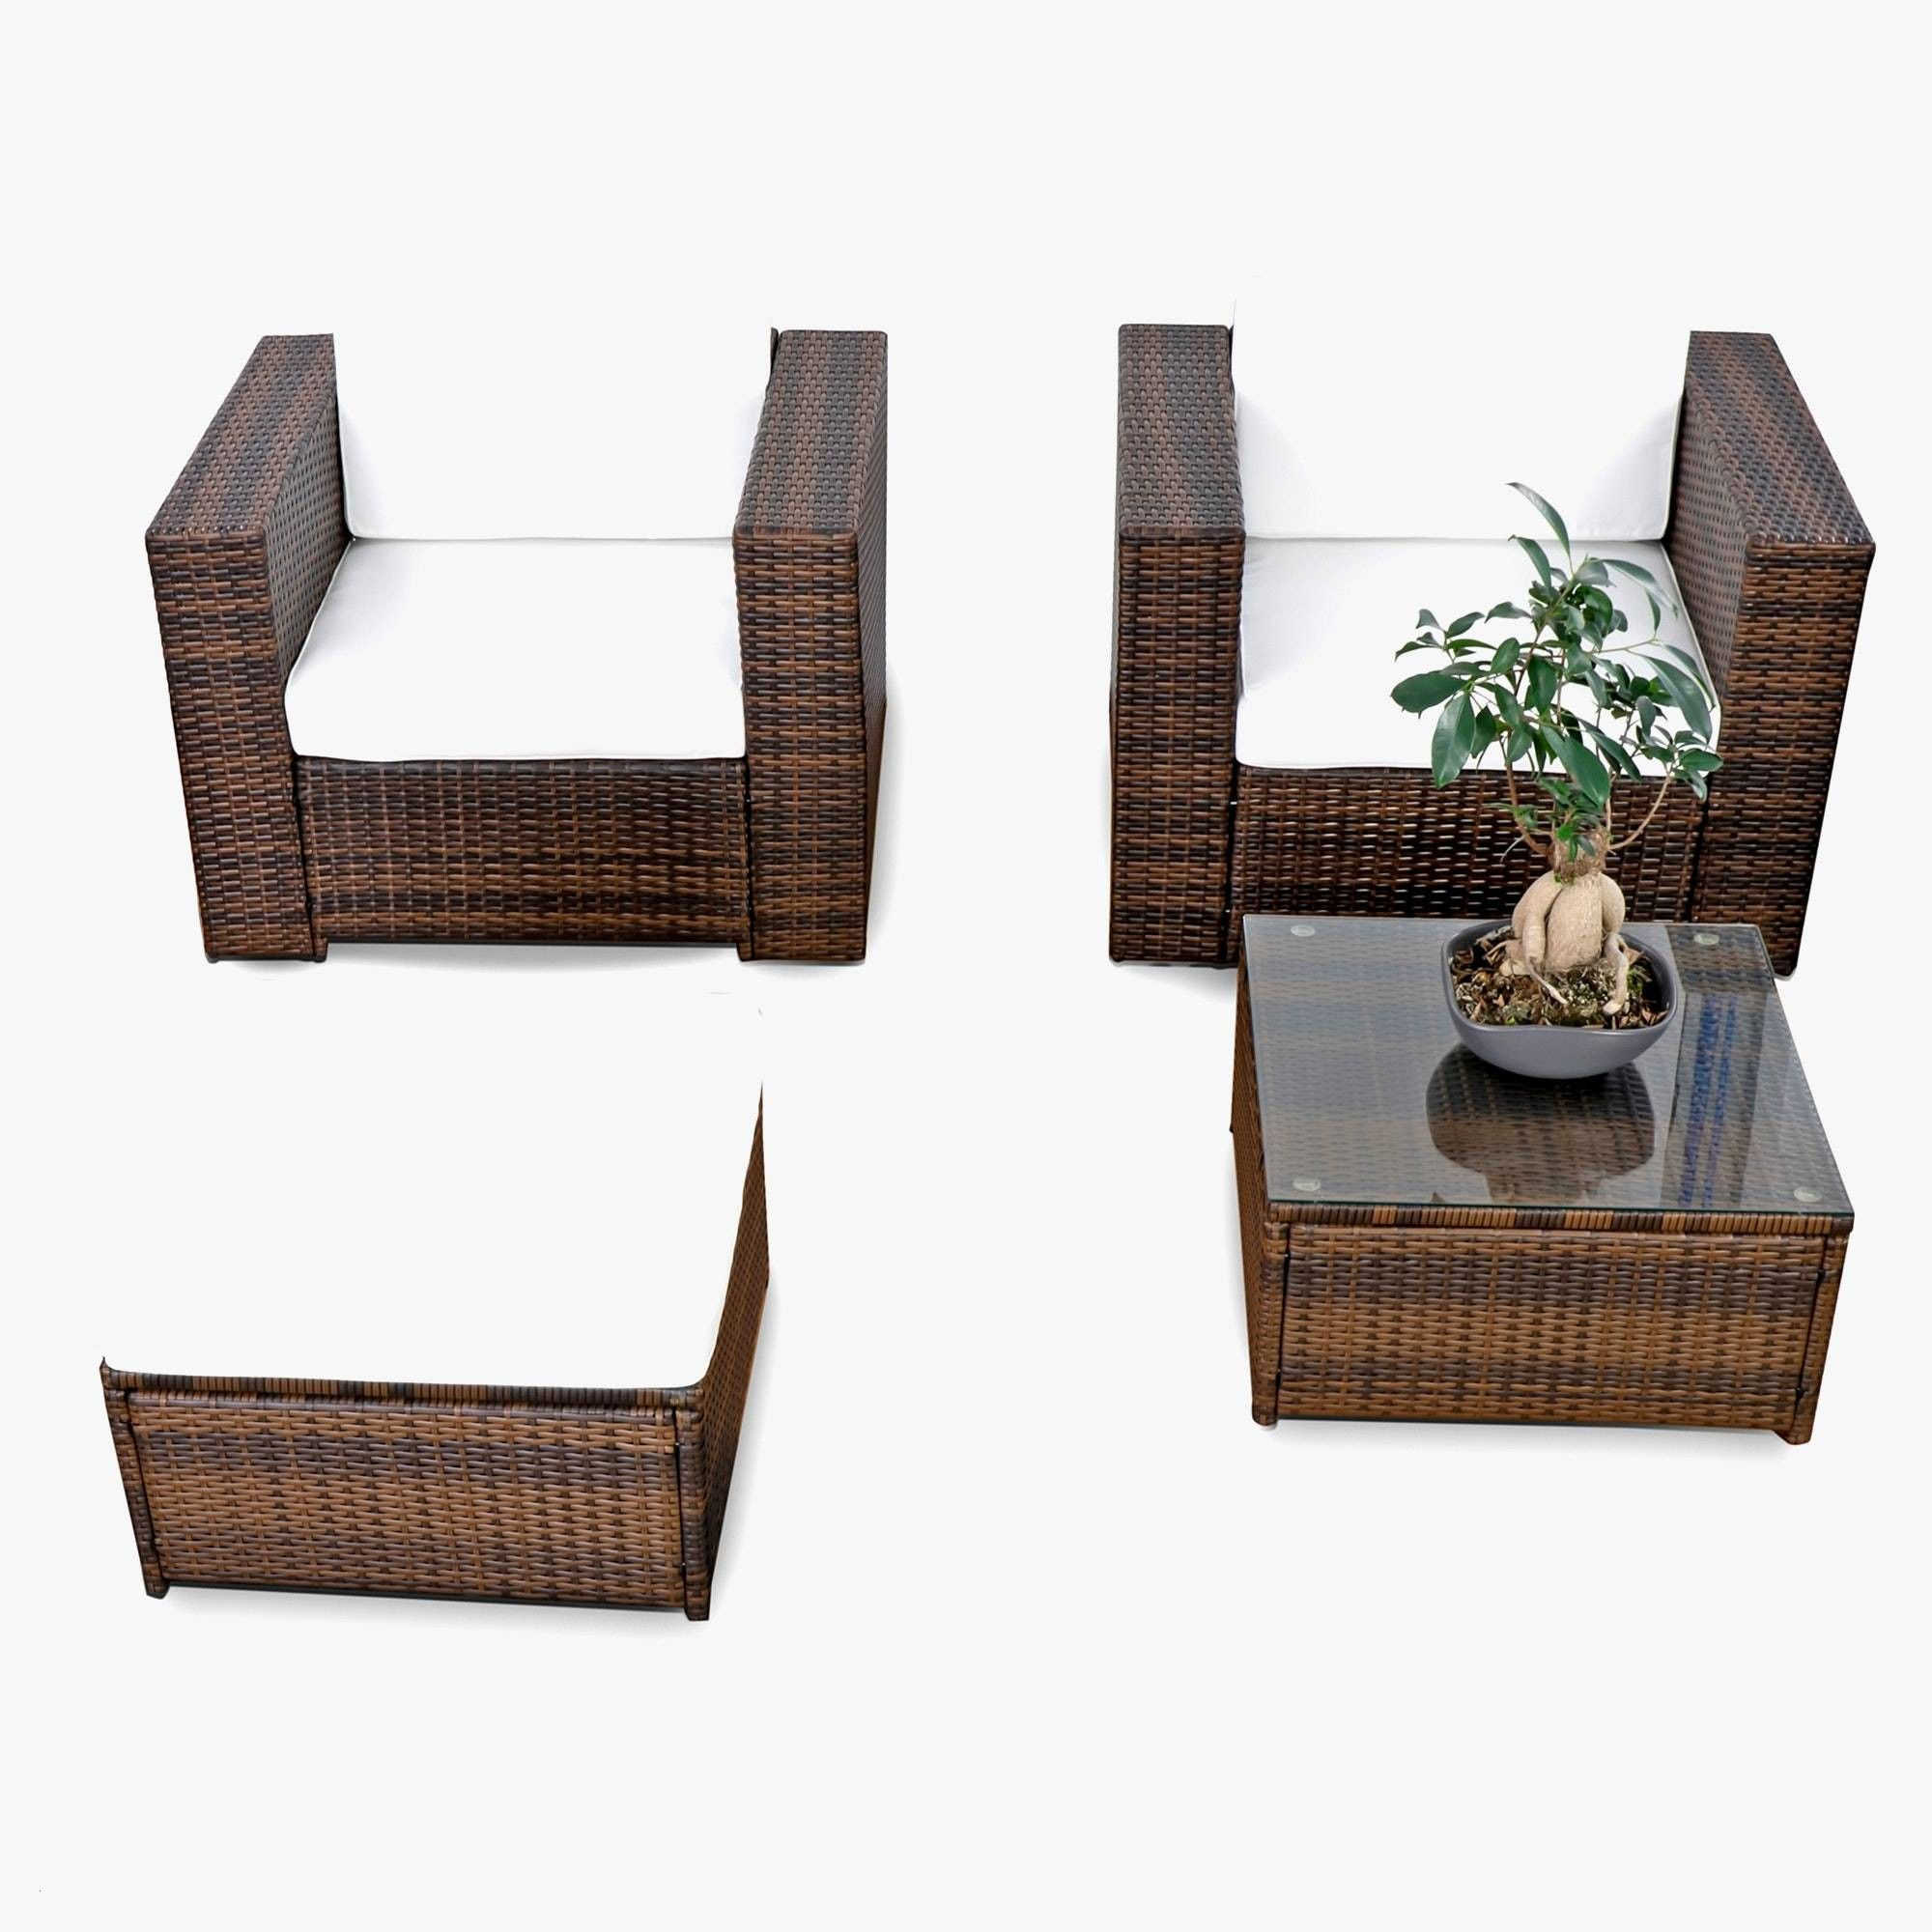 balkon tisch stuehle guenstige balkon ideen luxus schoen balkonmoebel set rattan sch c3 b6ne neu